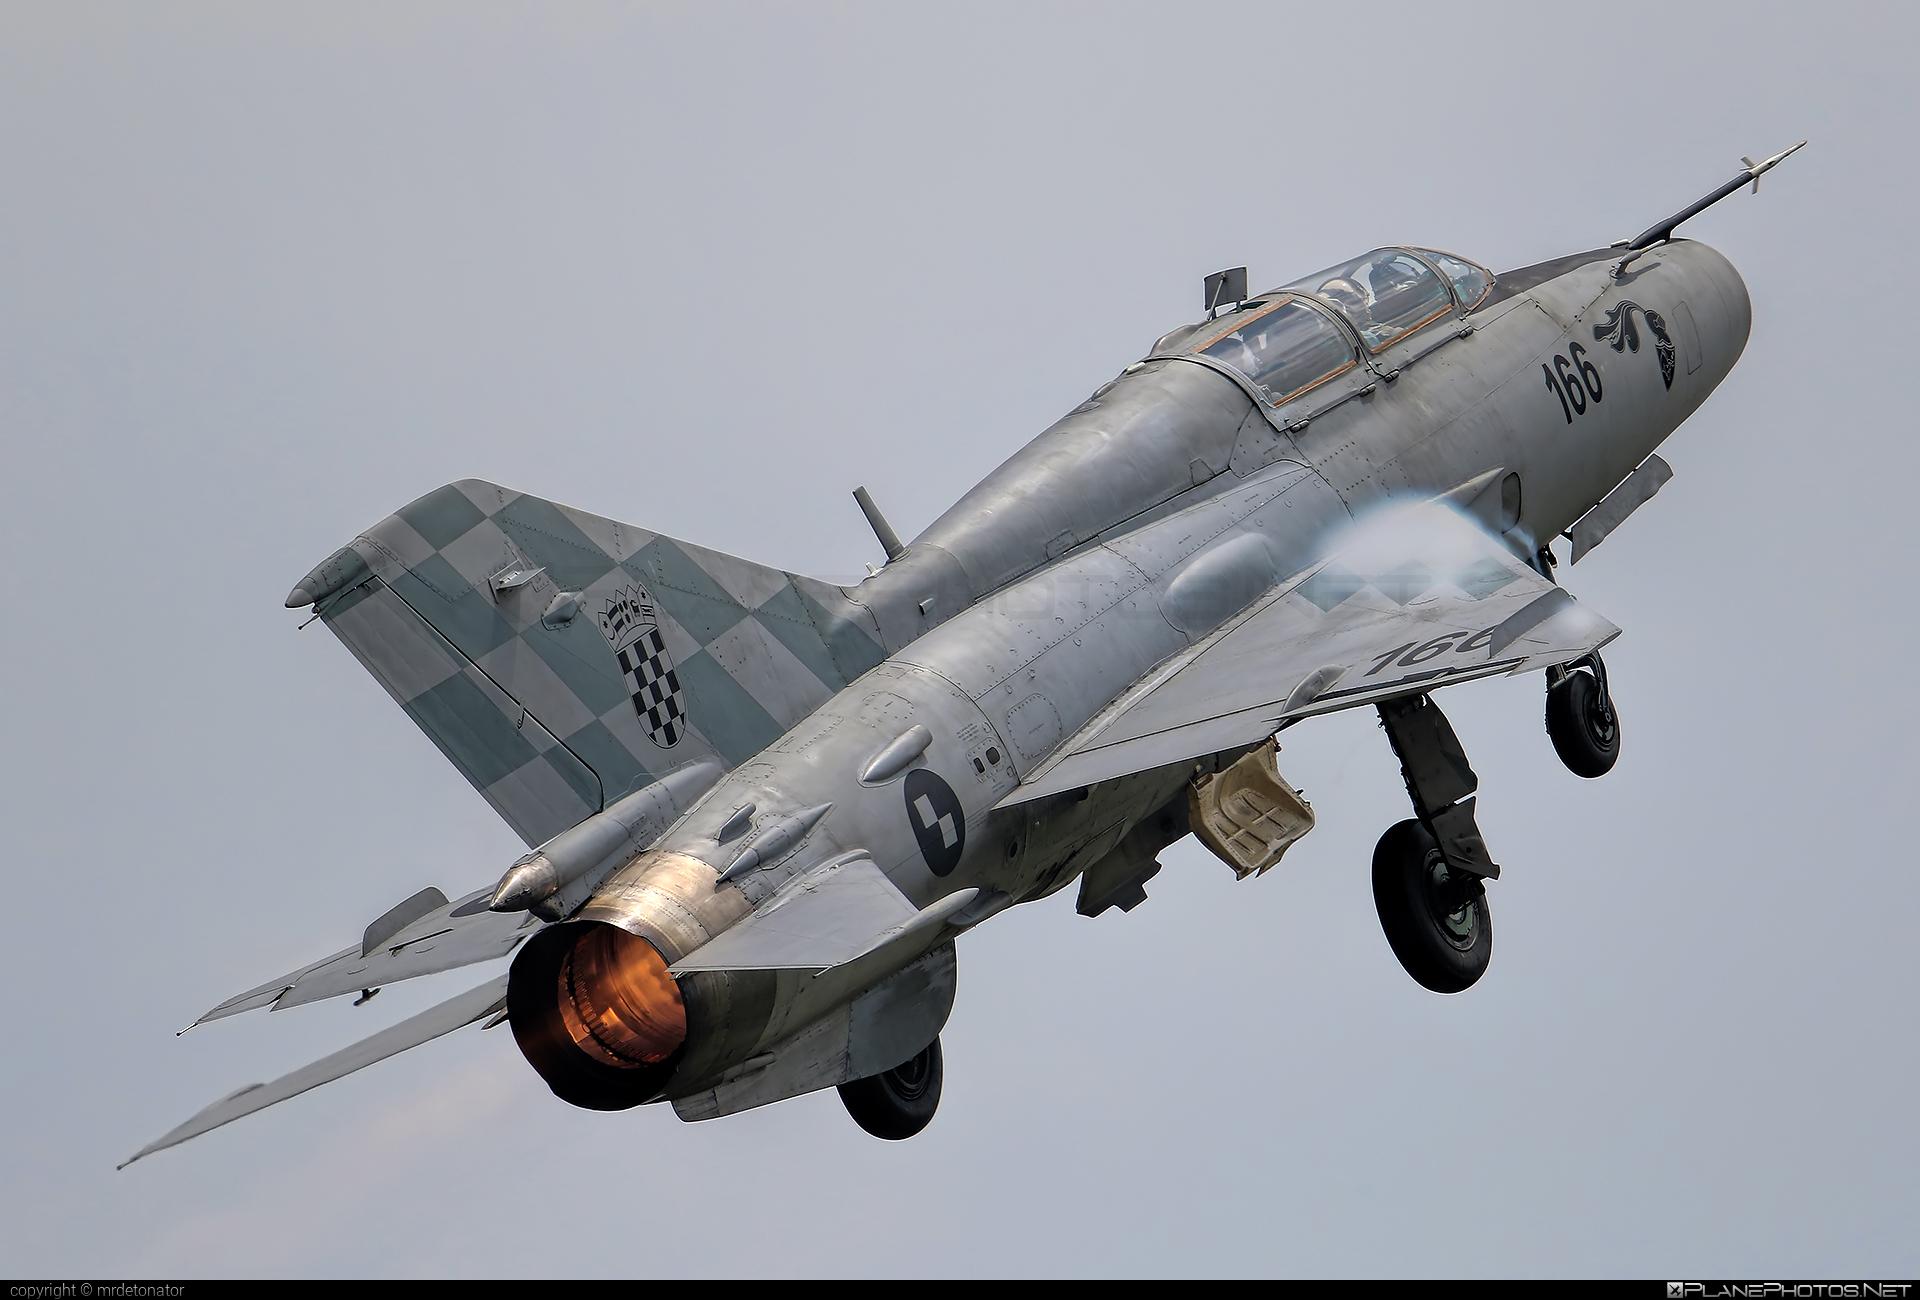 Mikoyan-Gurevich MiG-21UMD - 166 operated by Hrvatsko ratno zrakoplovstvo i protuzračna obrana (Croatian Air Force) #mig #mig21 #mig21umd #mikoyangurevich #varazdinairshow #varazdinairshow2018